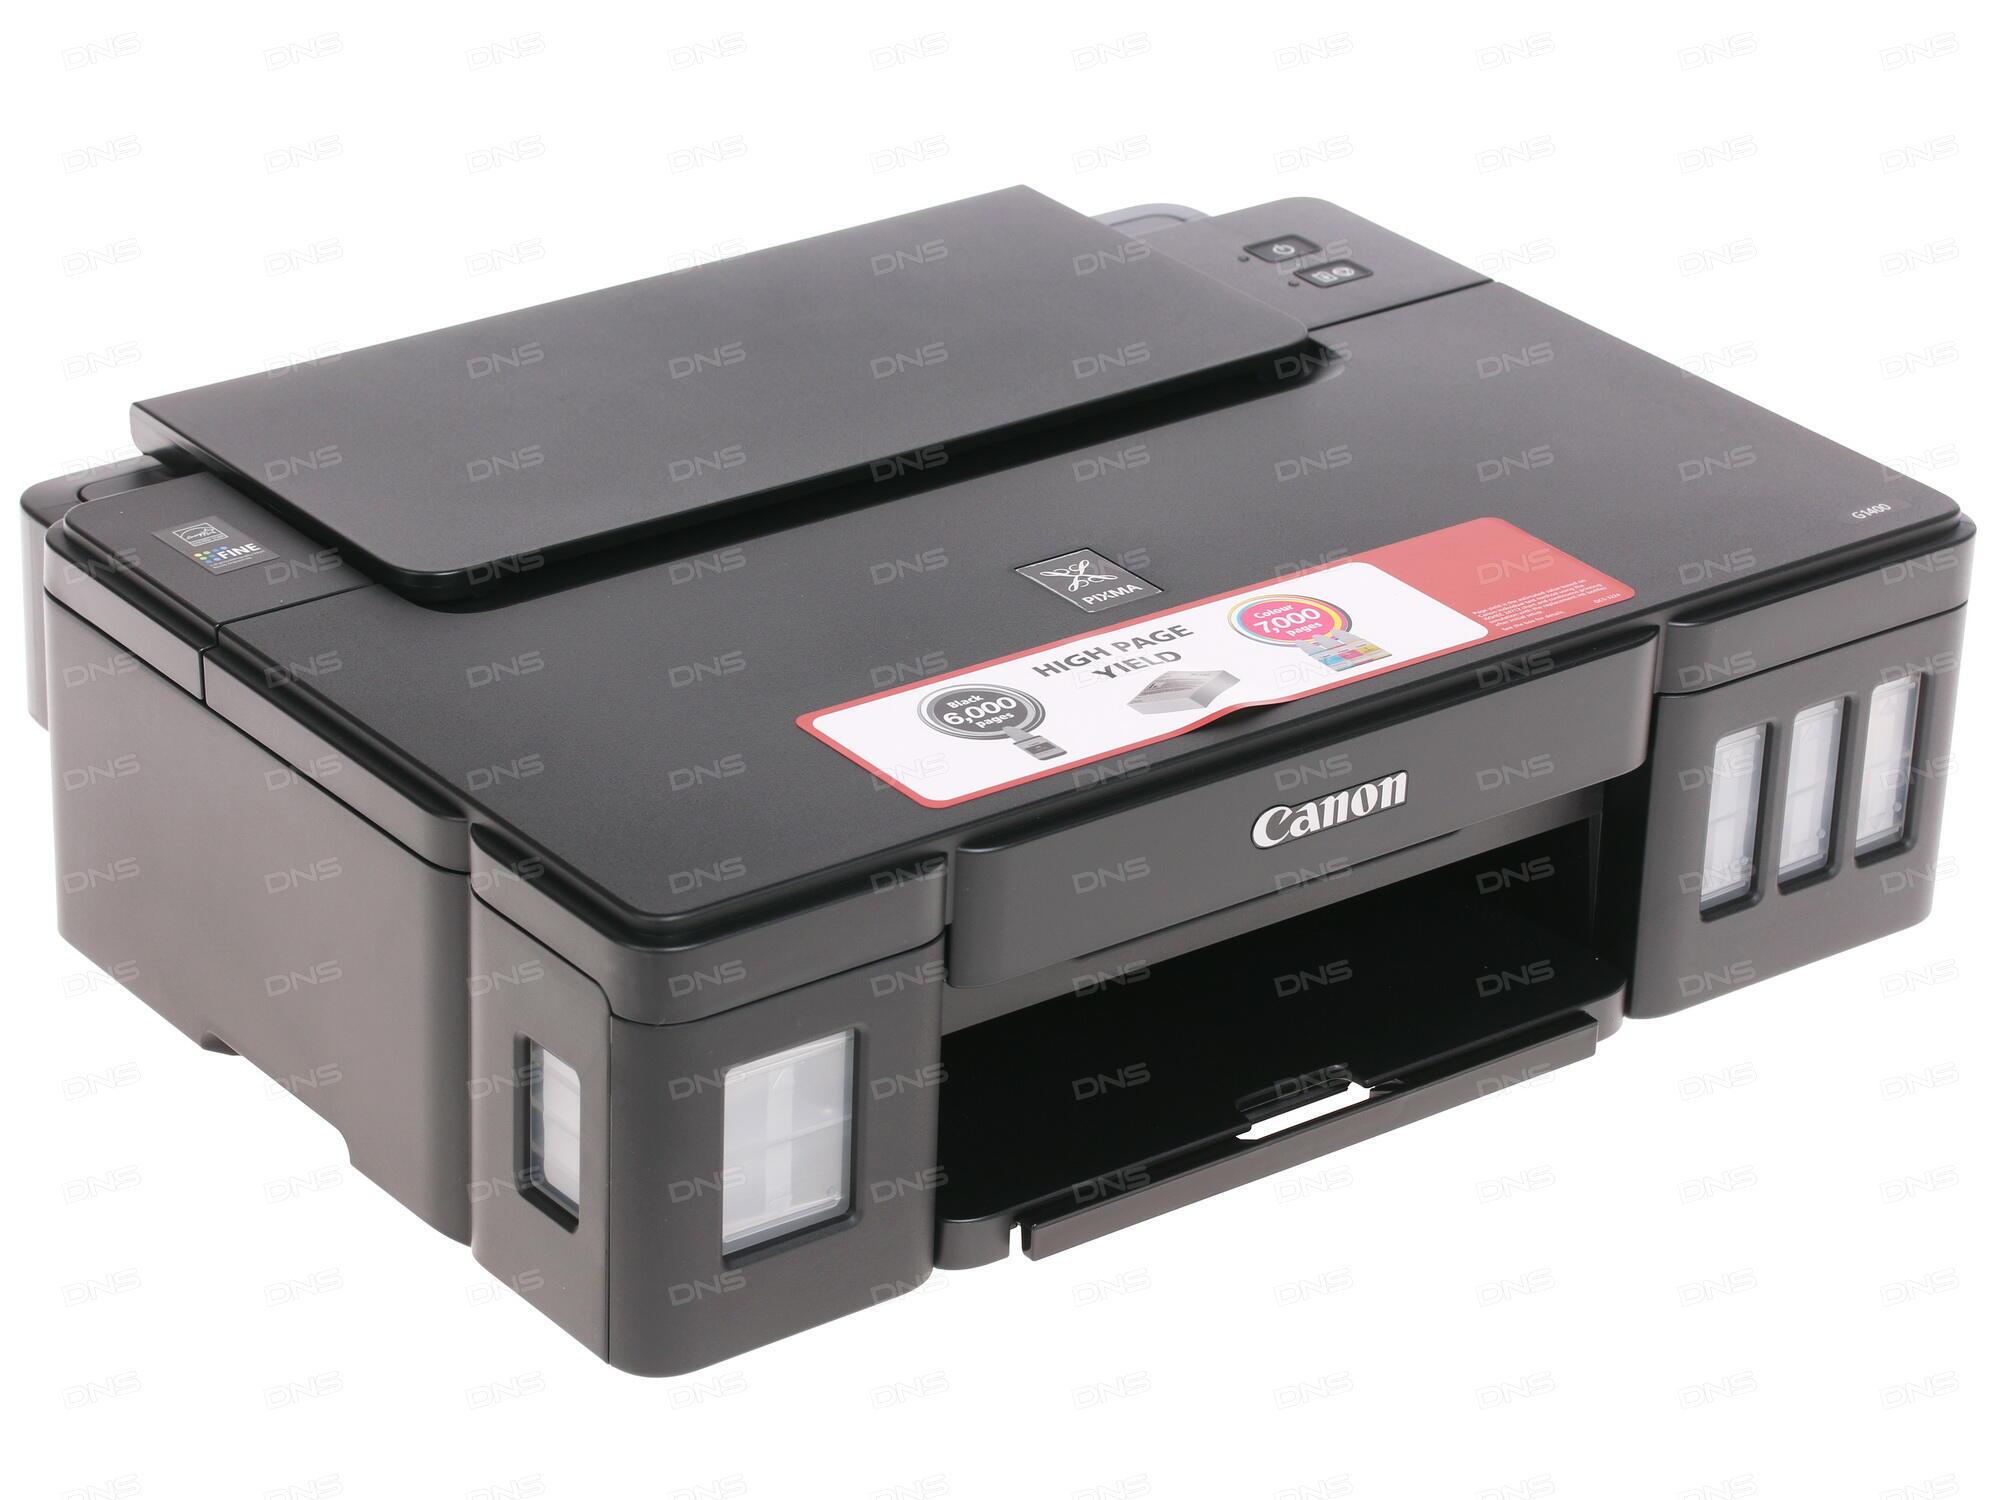 Картинки: CANON PIXMA IP2700 - купить принтер canon PIXMA IP2700 (Картинки) г.Нижний Новгород